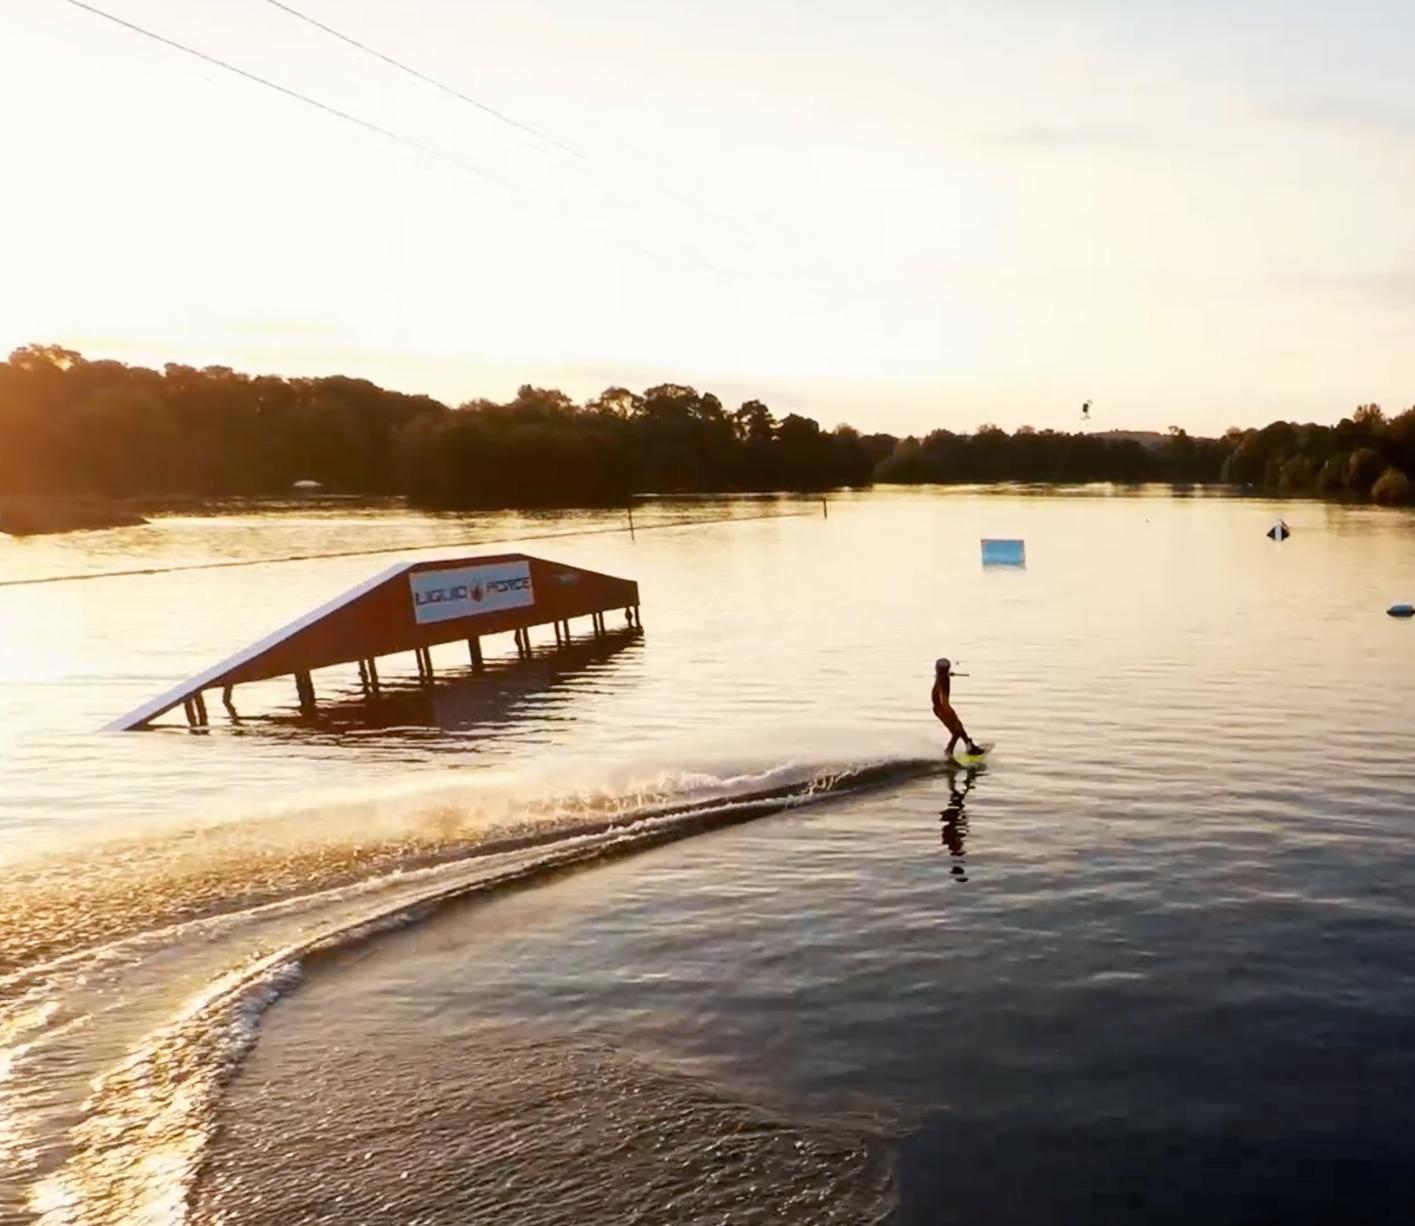 Joe Battleday - A Redbull wakeboard athlete